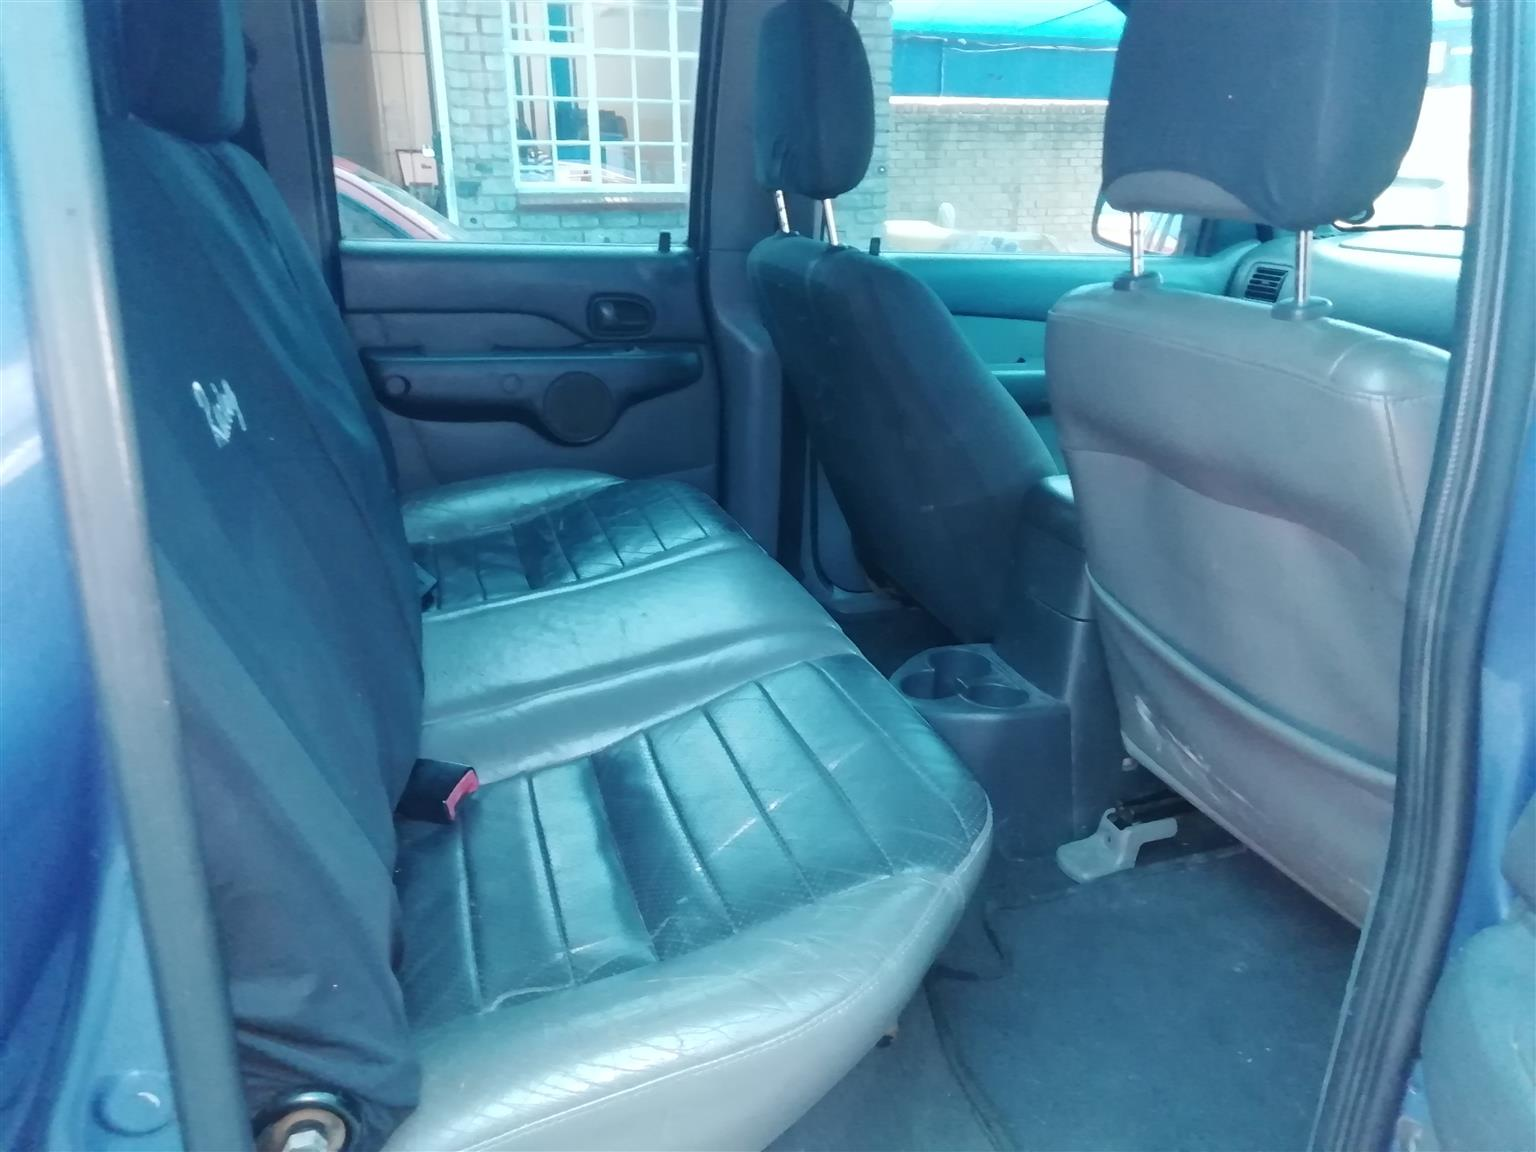 2005 Mazda Drifter B2500TD hi ride double cab SLE